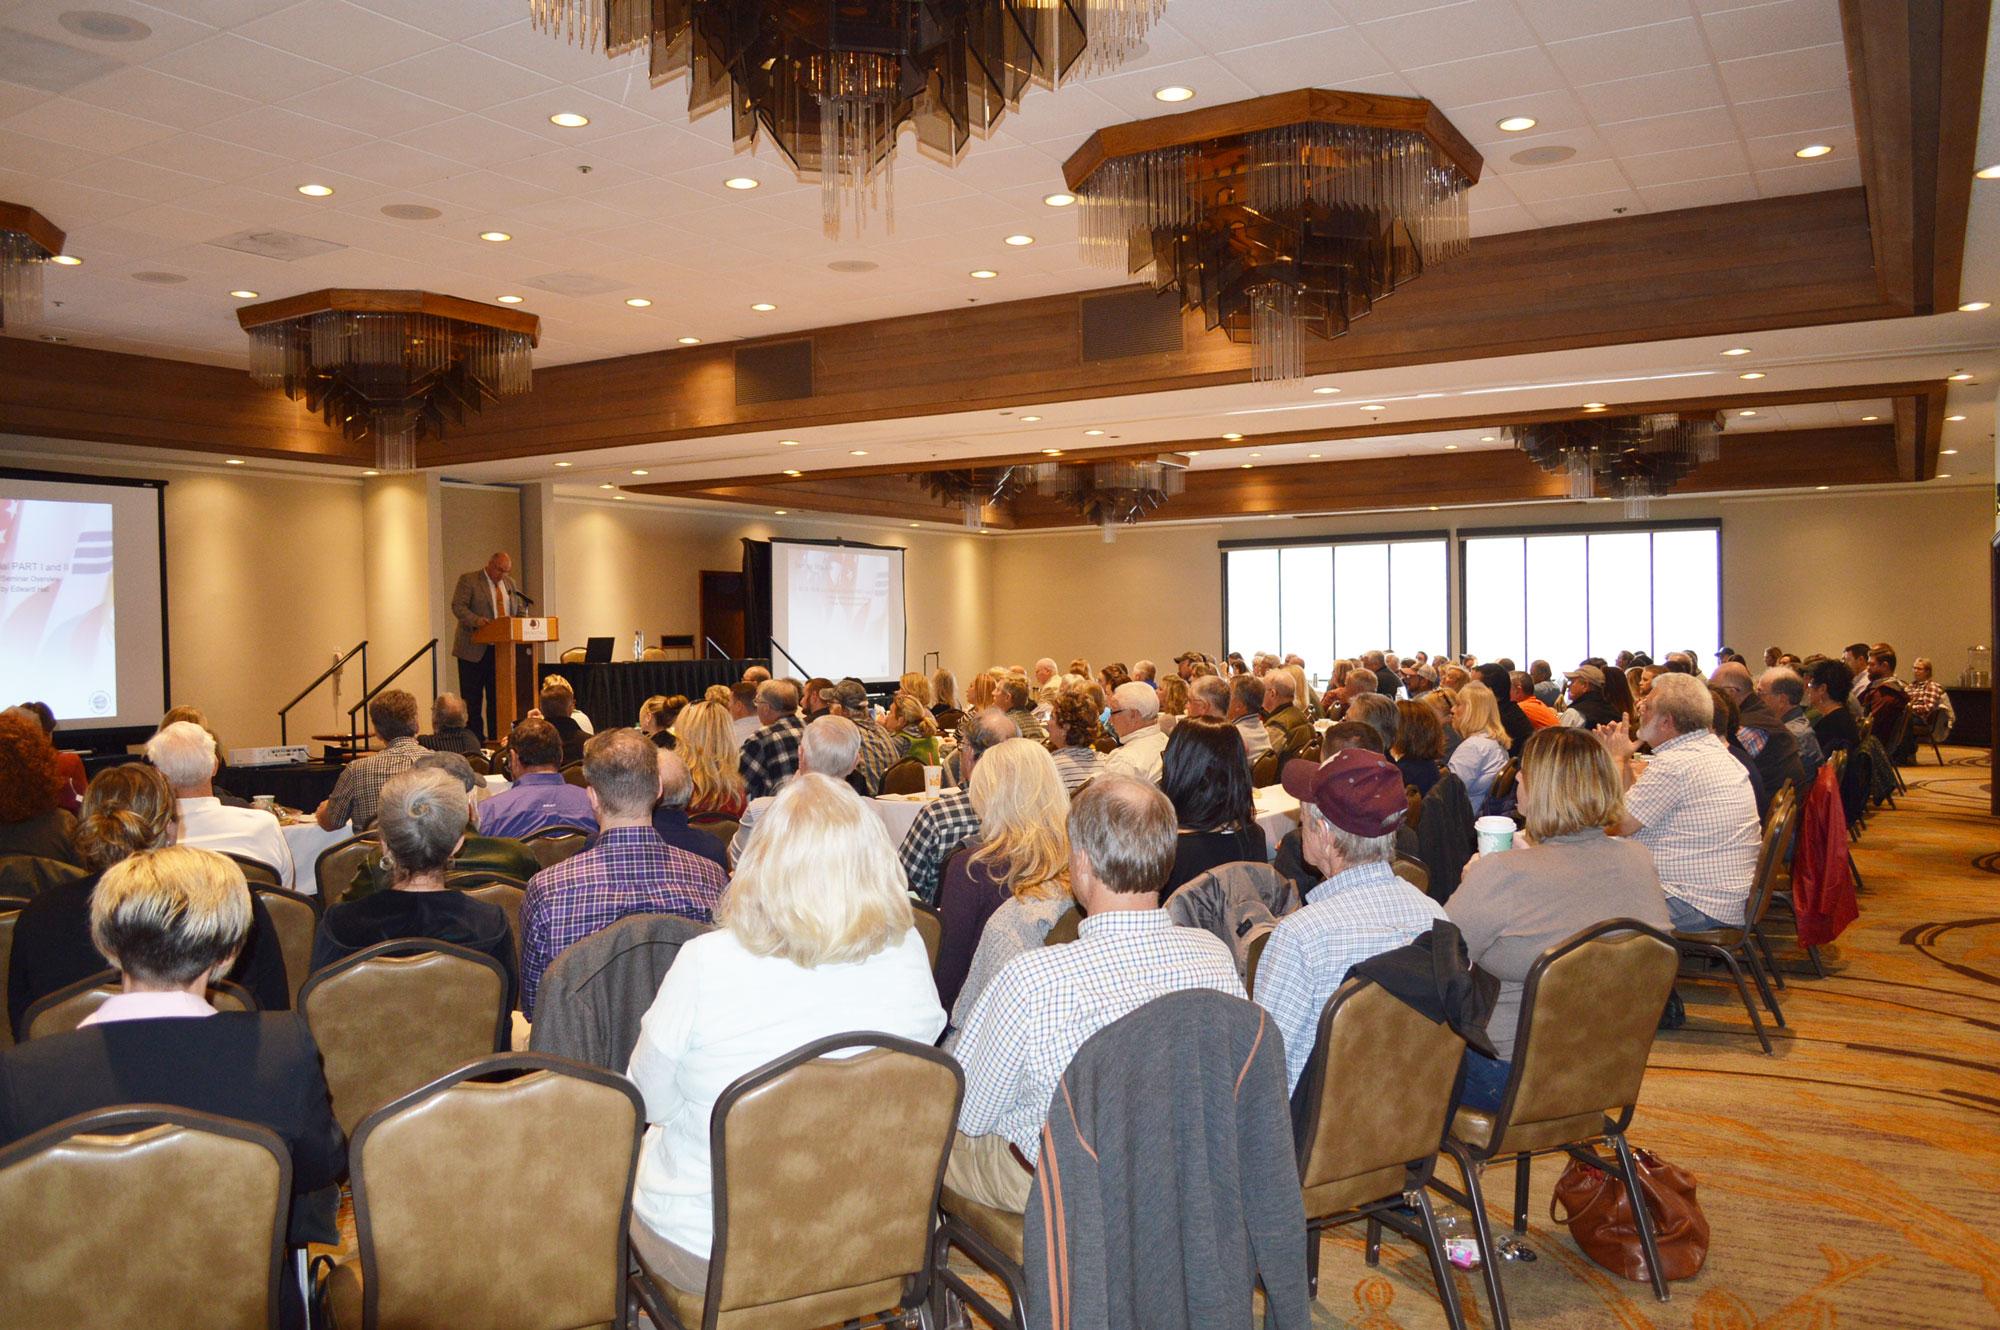 seminar room full of people